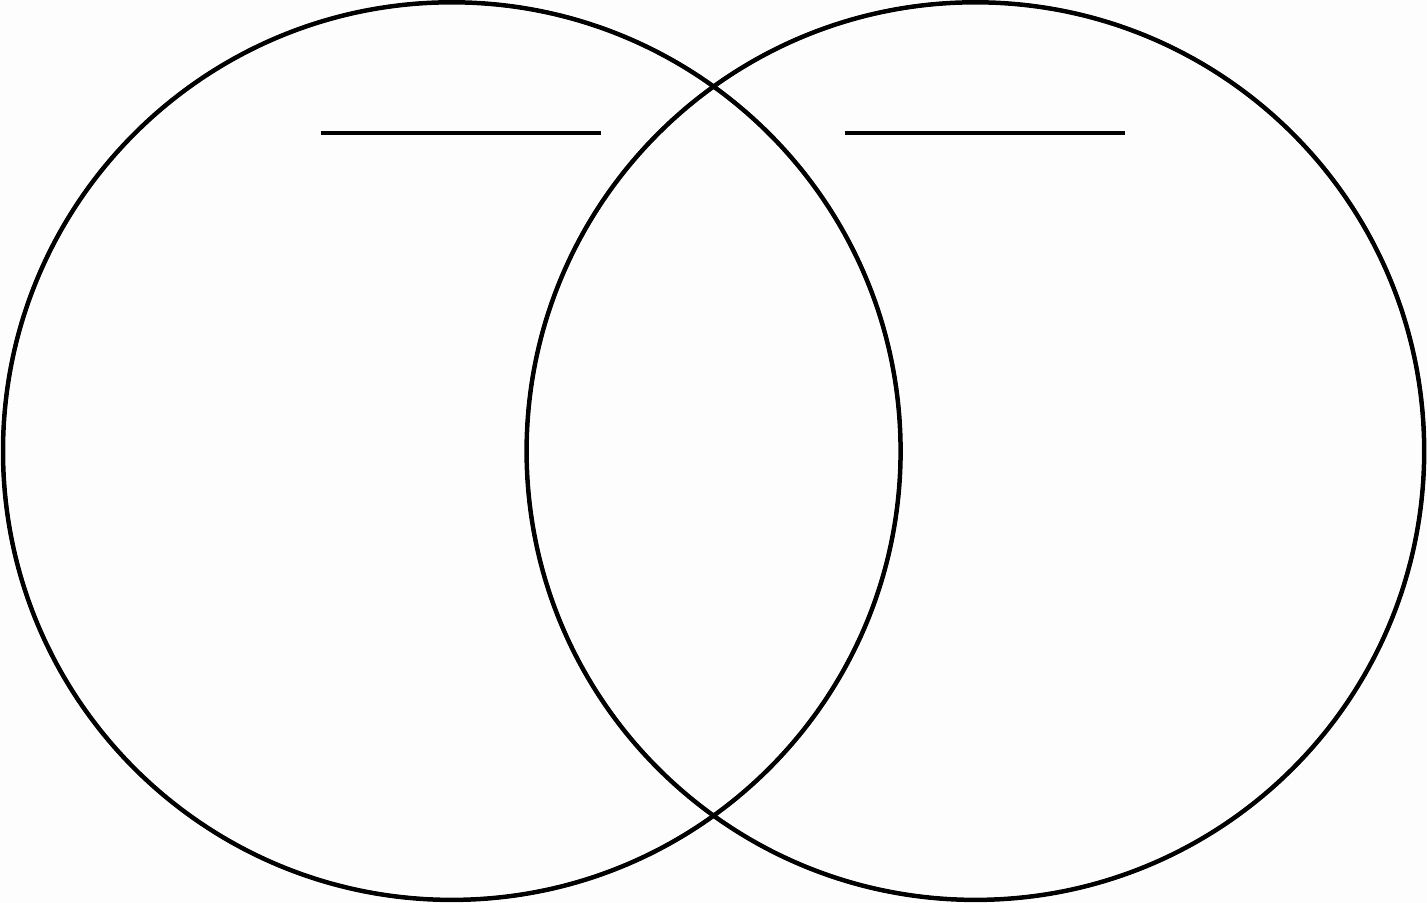 Venn Diagram Template Doc Unique Venn Diagram In Word And